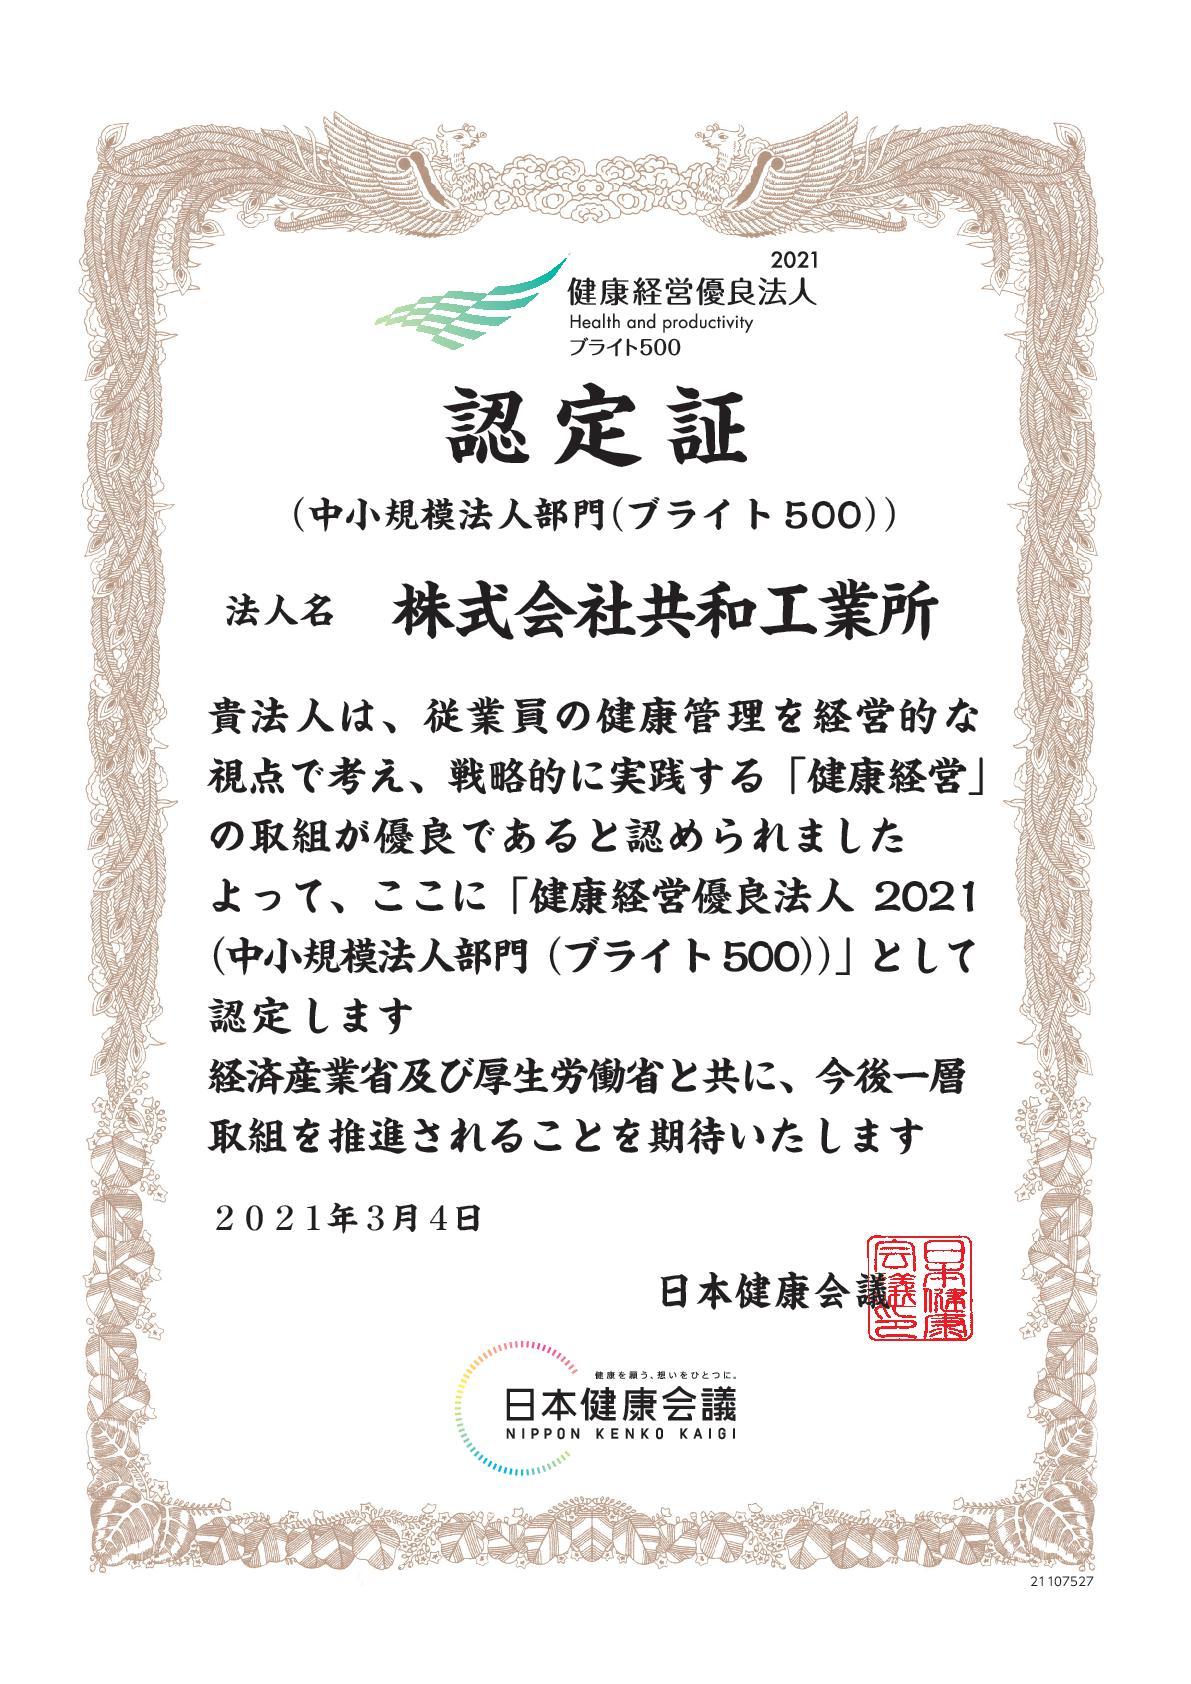 健康経営優良法人2021(中小規模法人部門(ブライト500))賞状